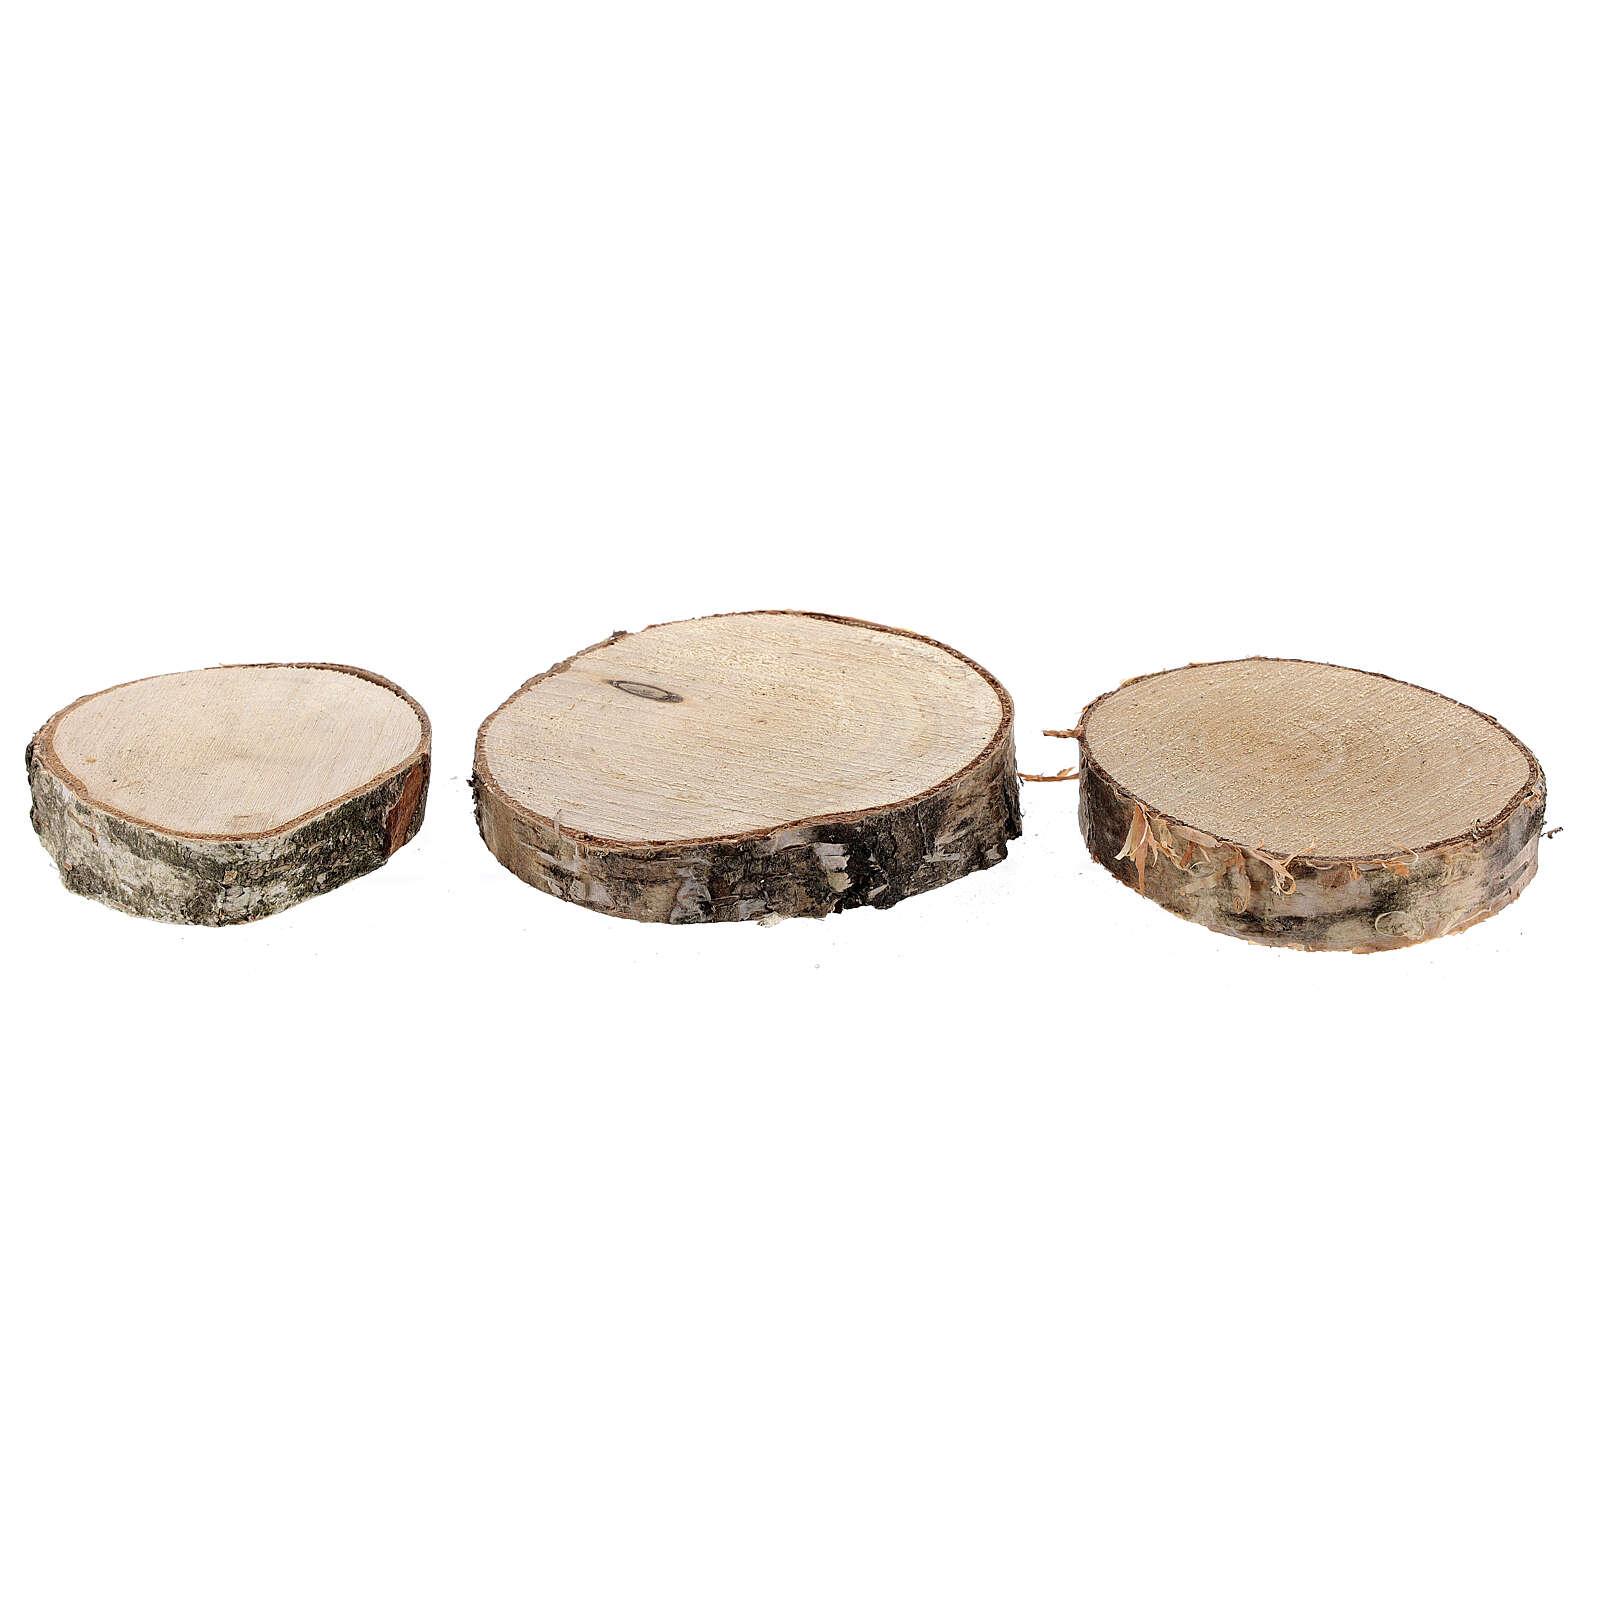 Sezione tronchi presepe diam 6-8 cm 4